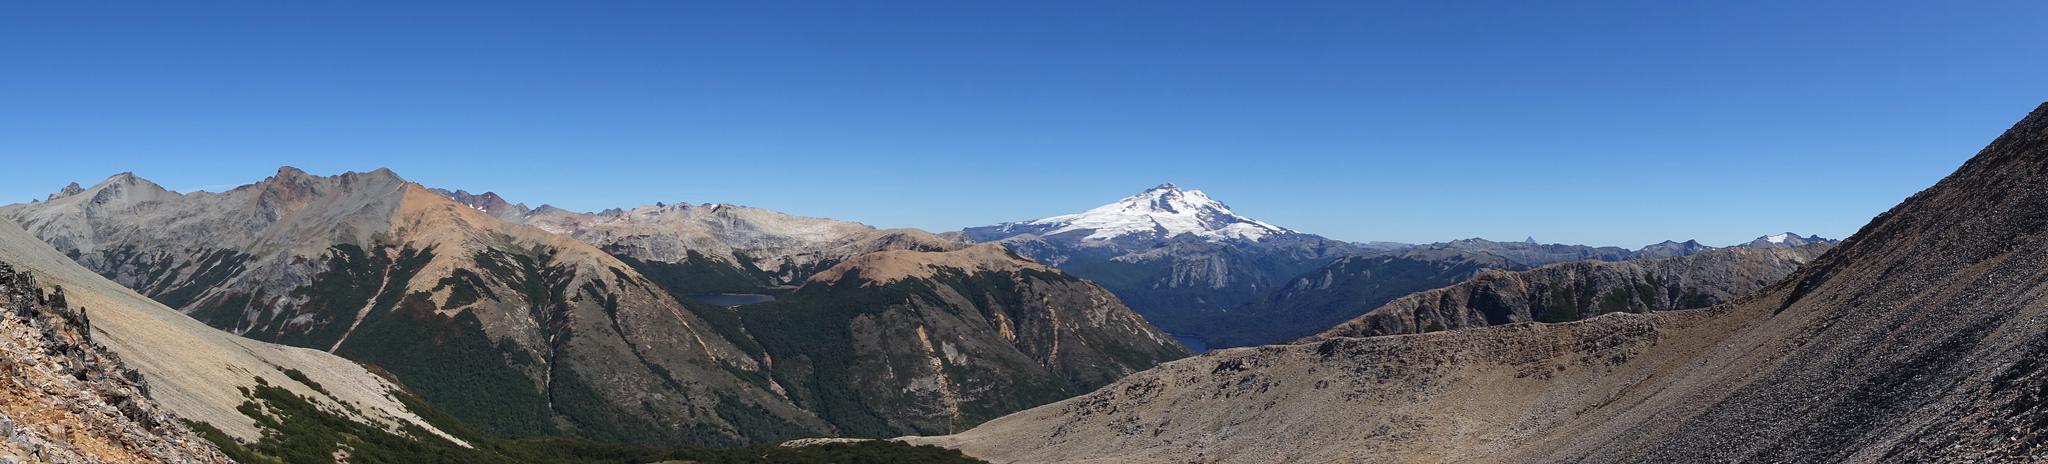 Panorama from ridge above Laguna Negra, including Lago CAB and Monte Tronador